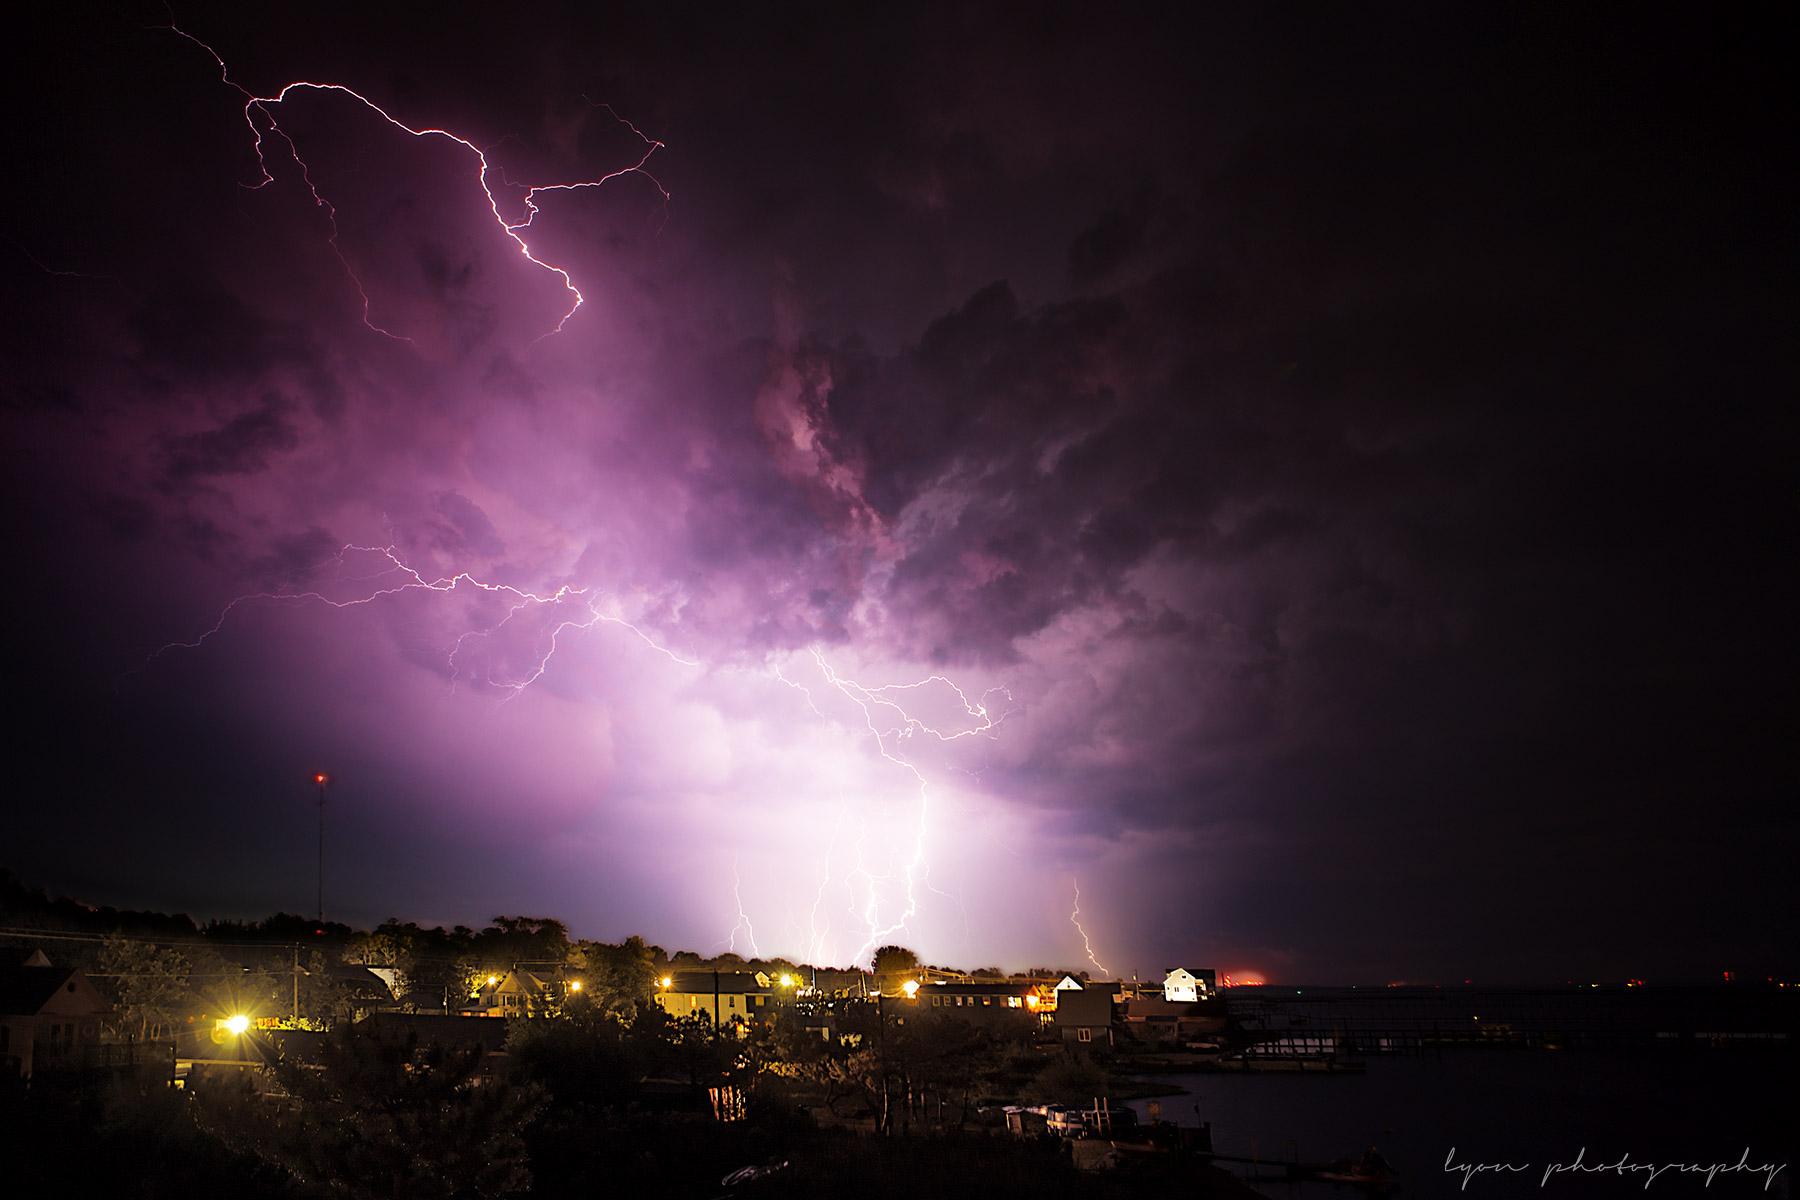 Lyon_Photography-chincoteague_storm5